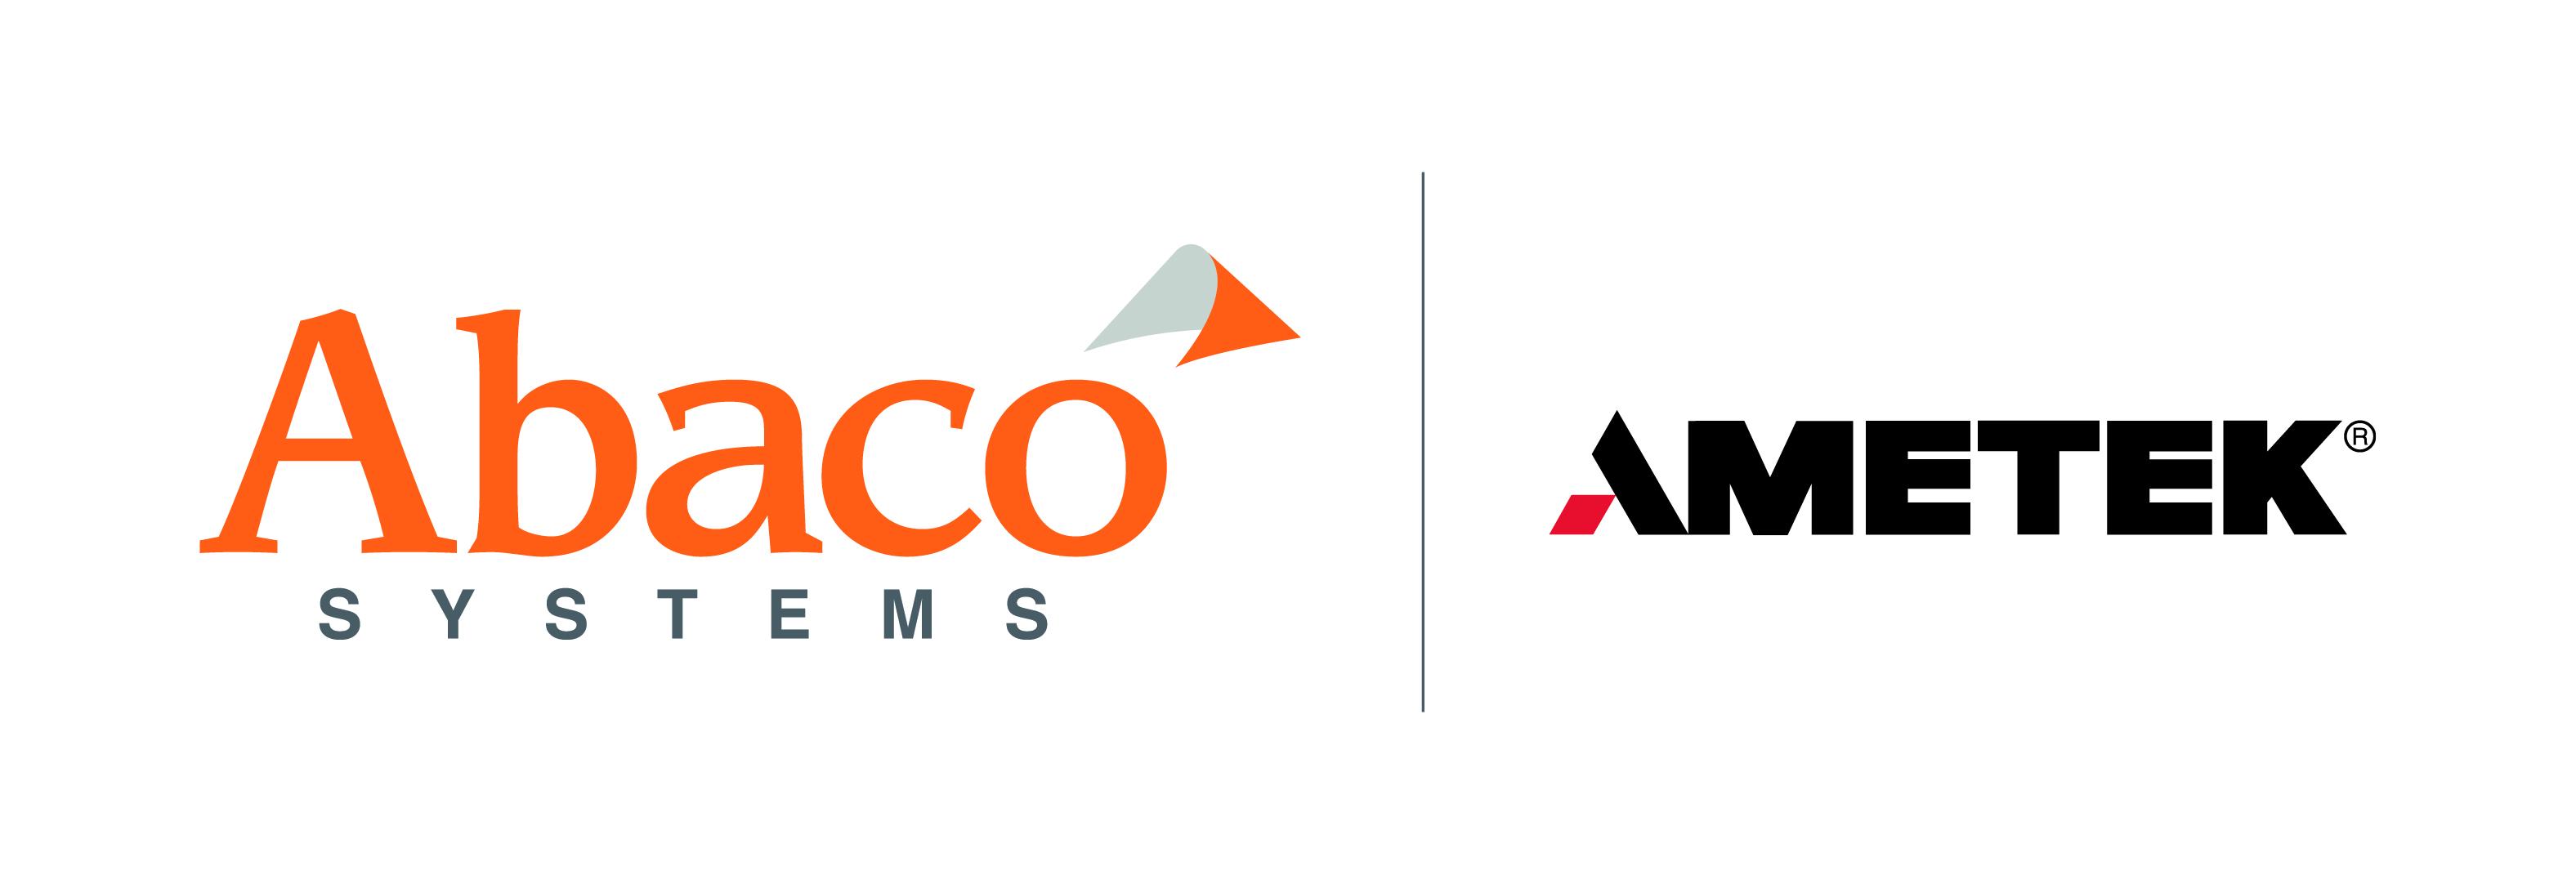 AMETEK Abaco Systems horizontal logo